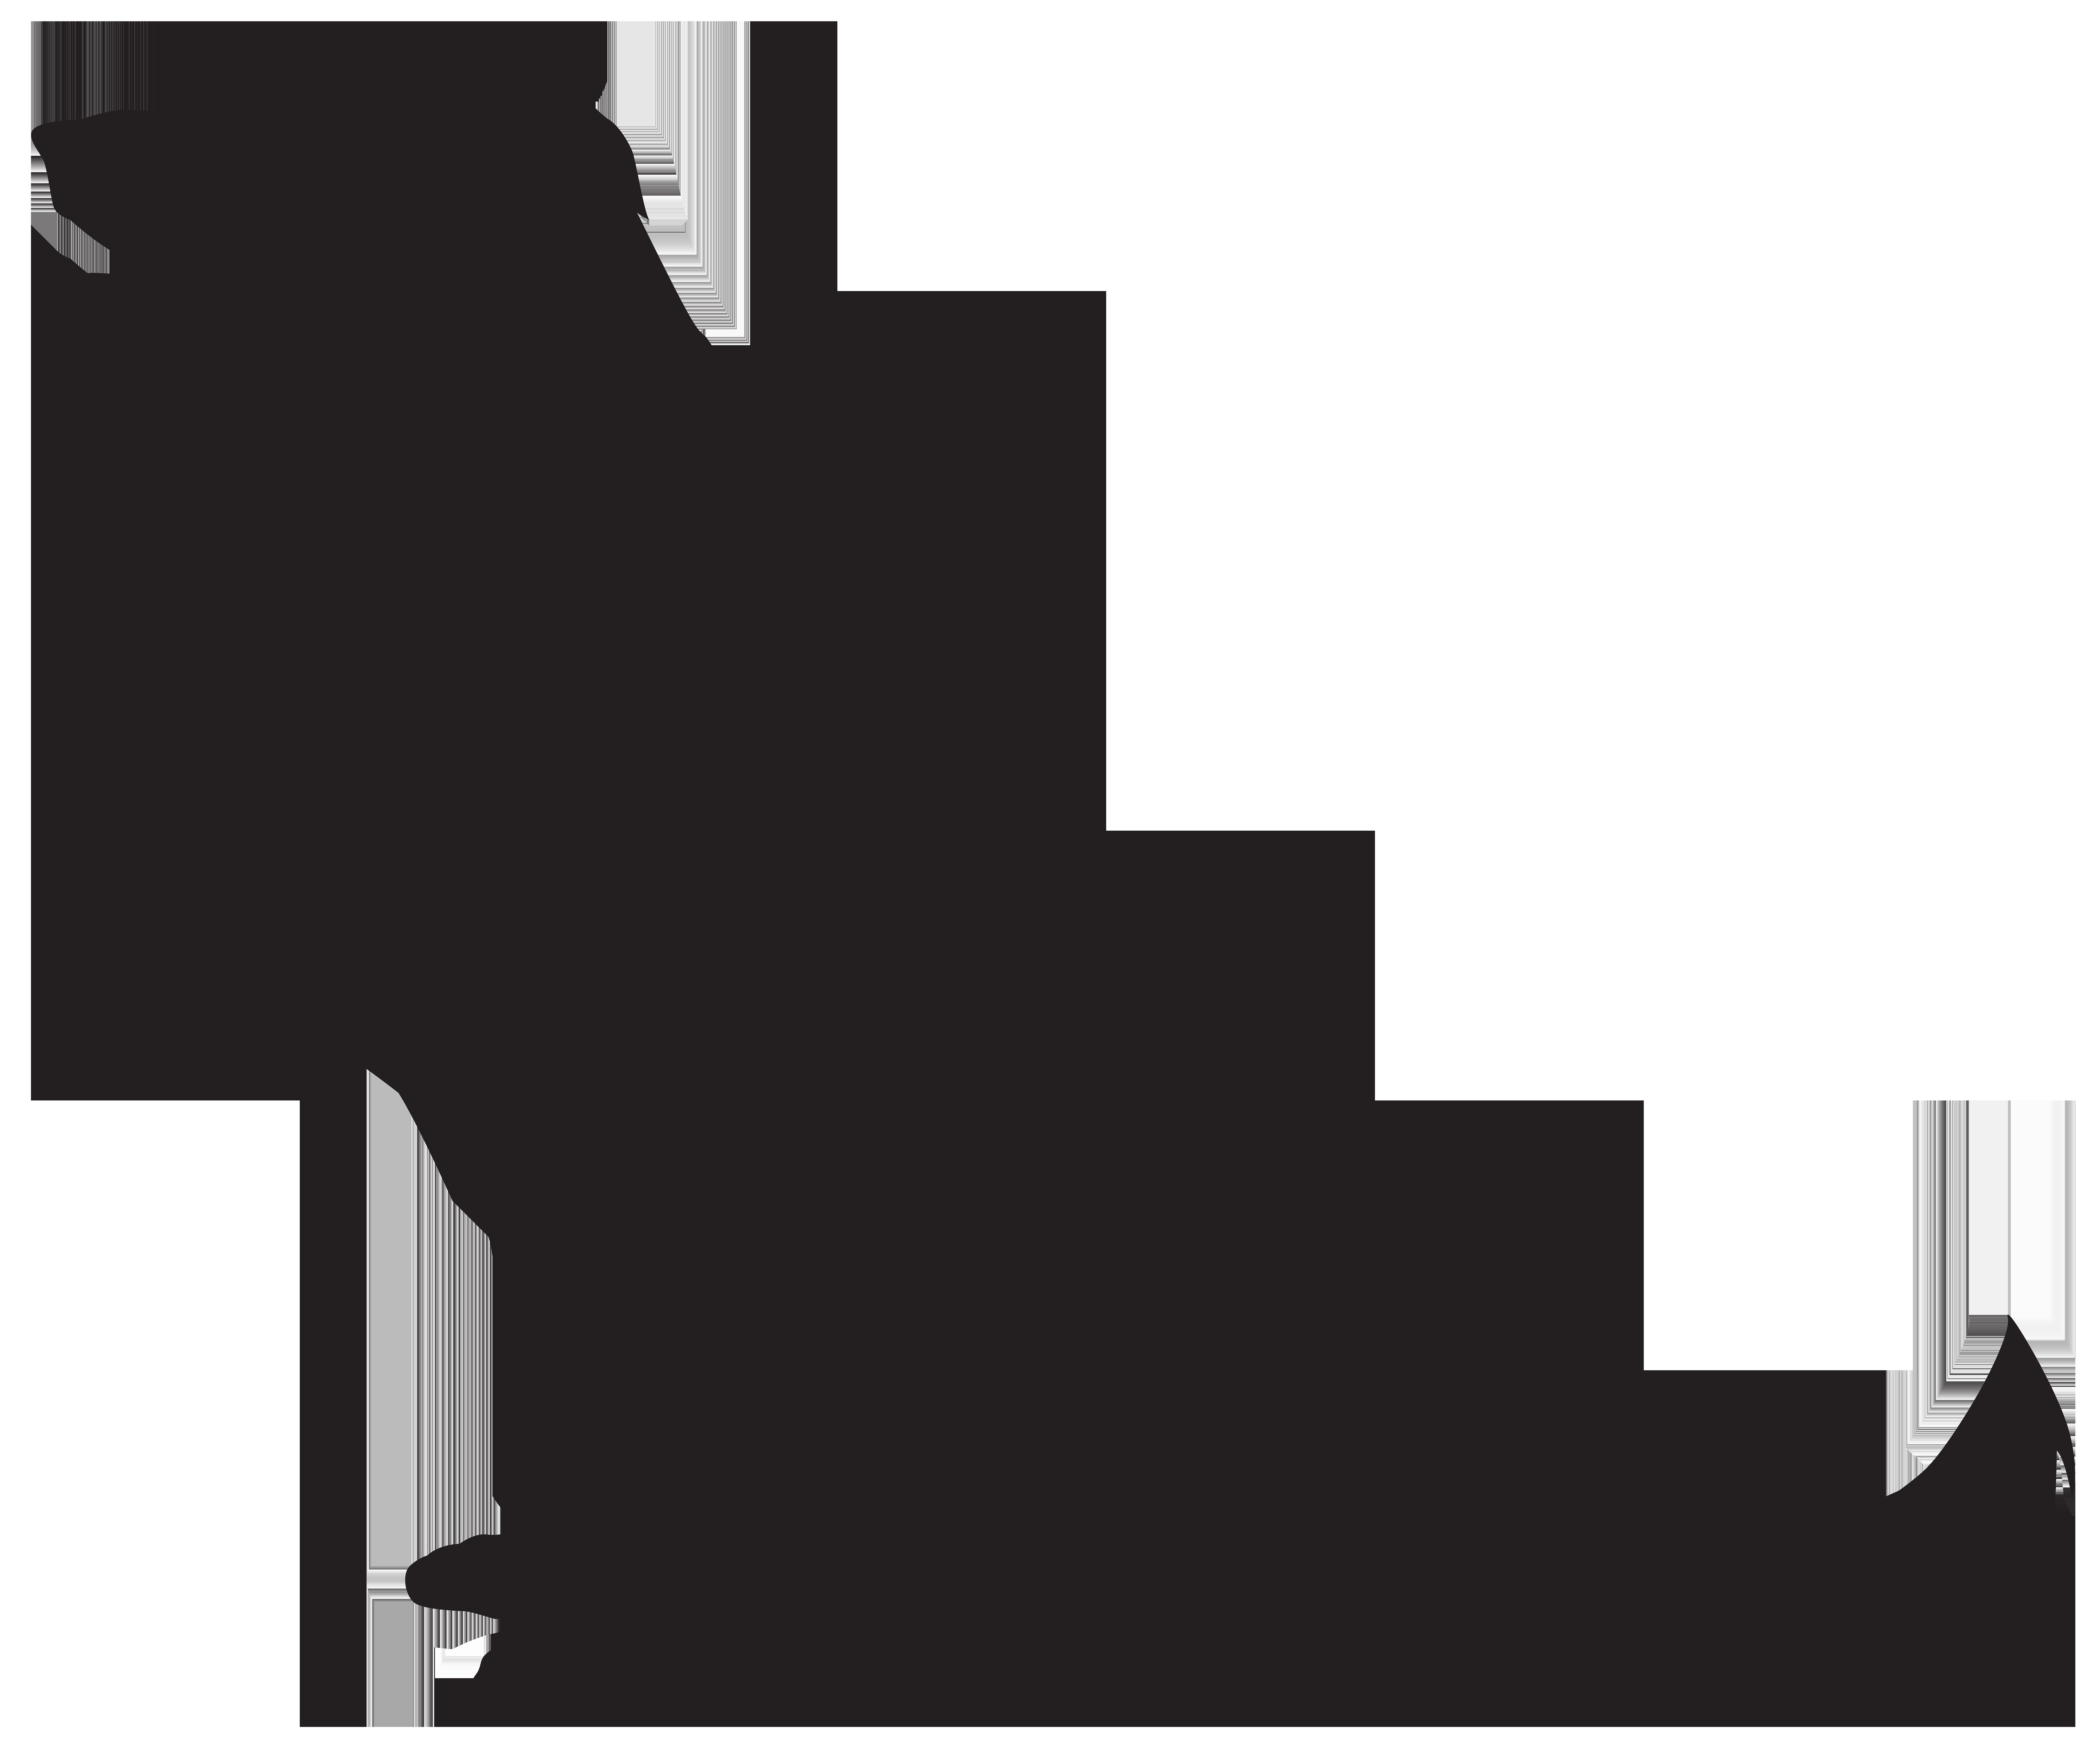 8000x6706 Dog Silhouette Png Transparent Clip Art Imageu200b Gallery